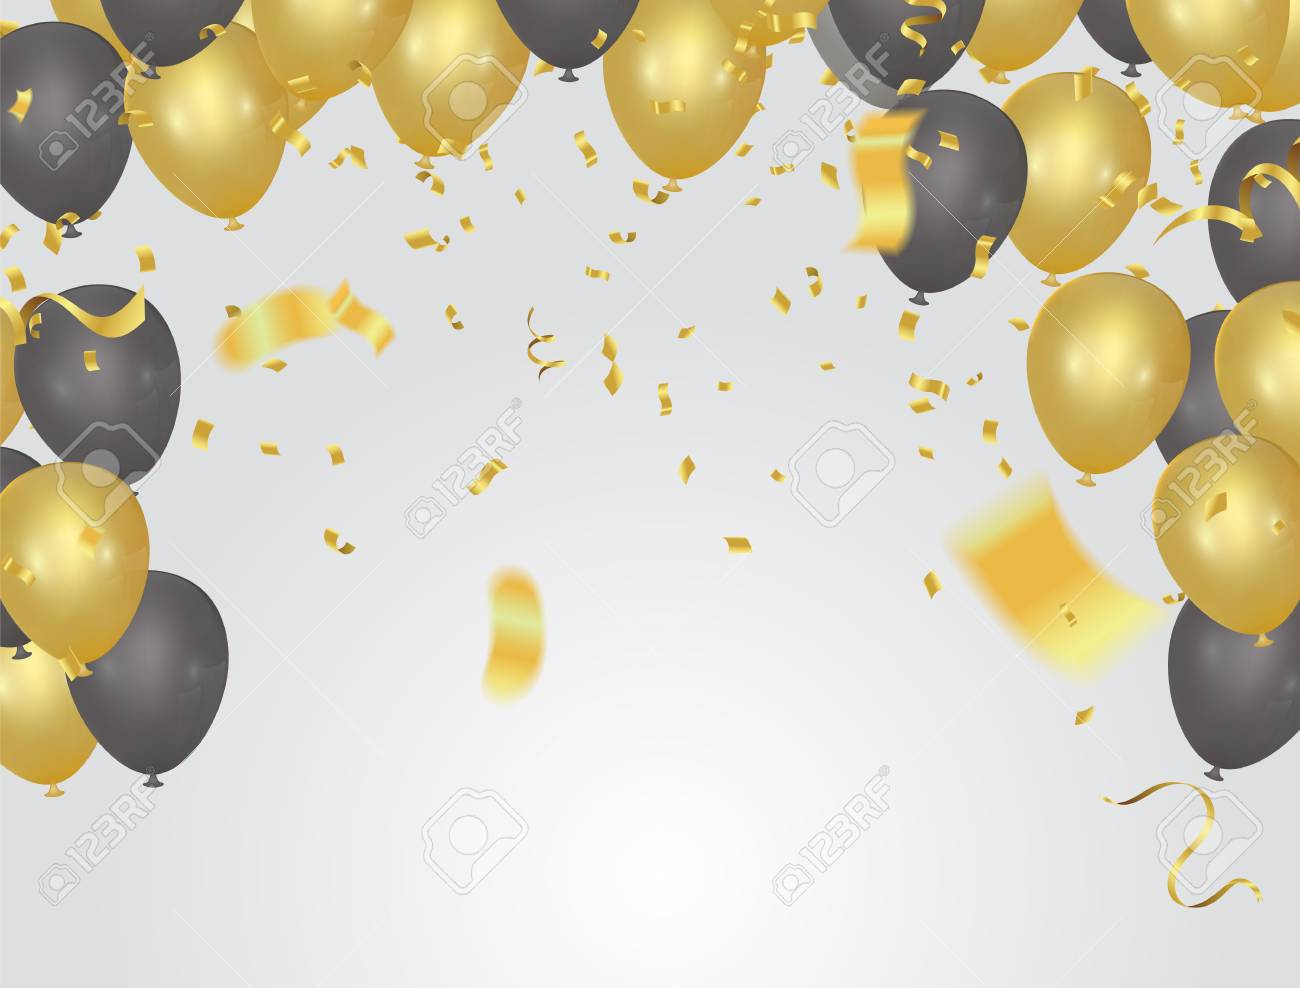 festive card golden balloons and confetti, party invitation. festive celebration - 96330485